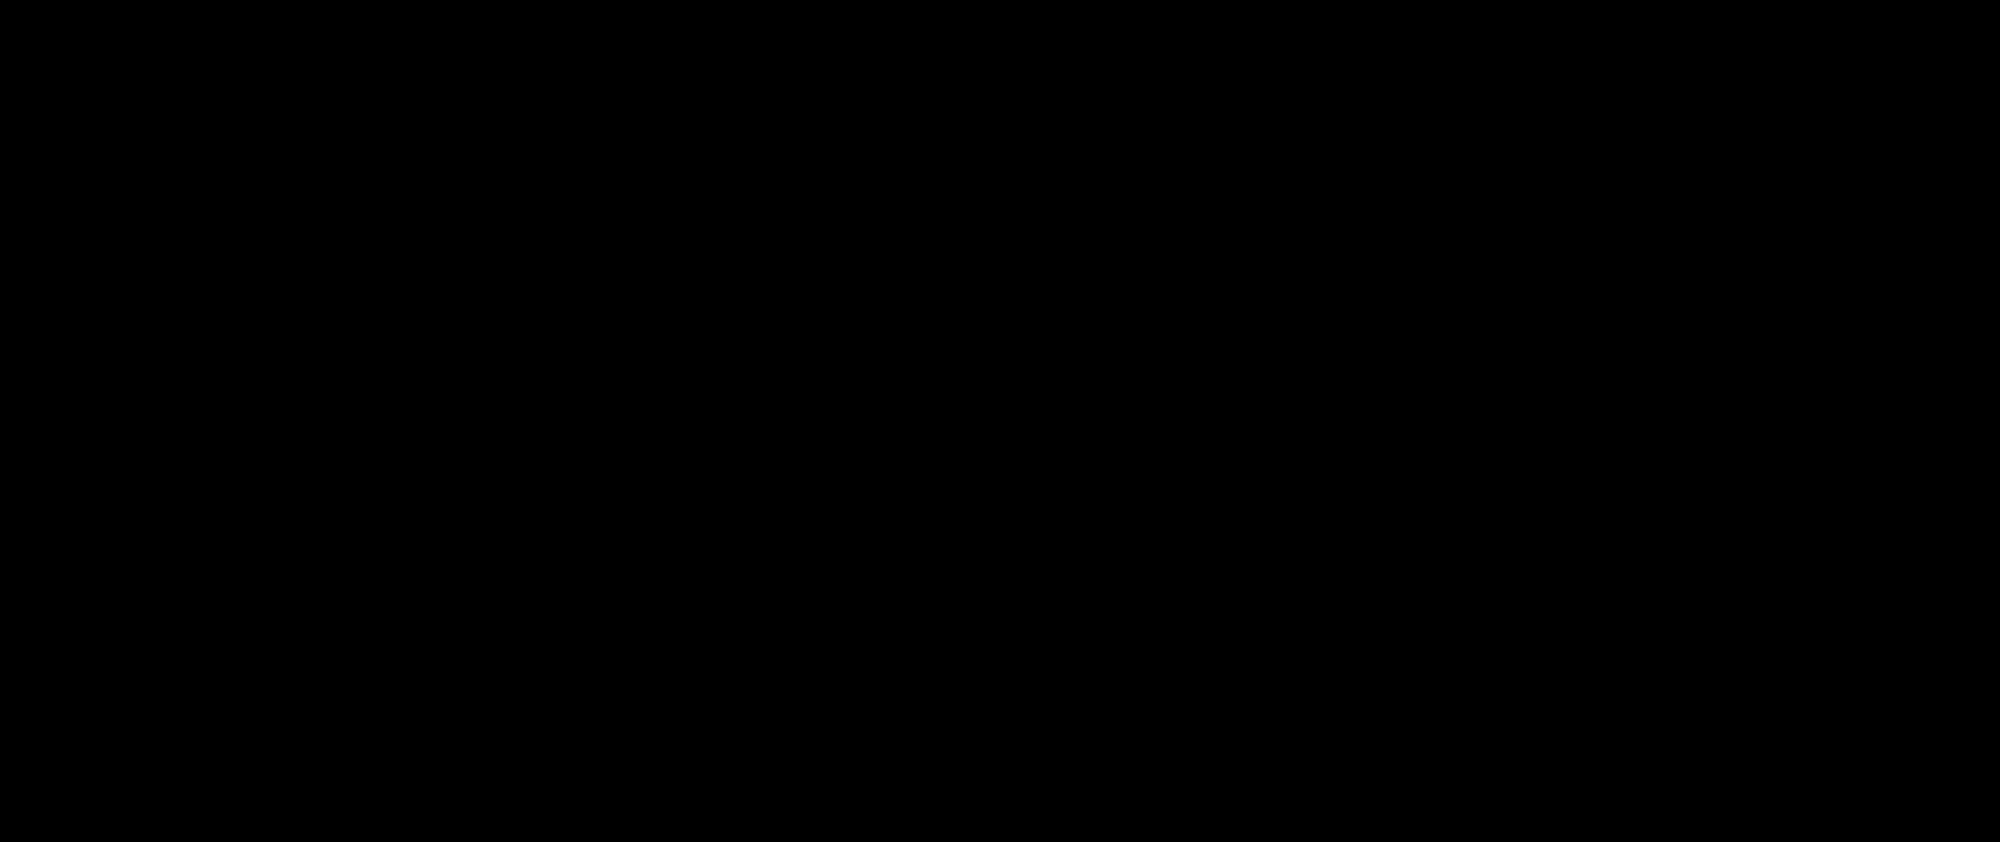 clip art download Vector band logo.  logos png for